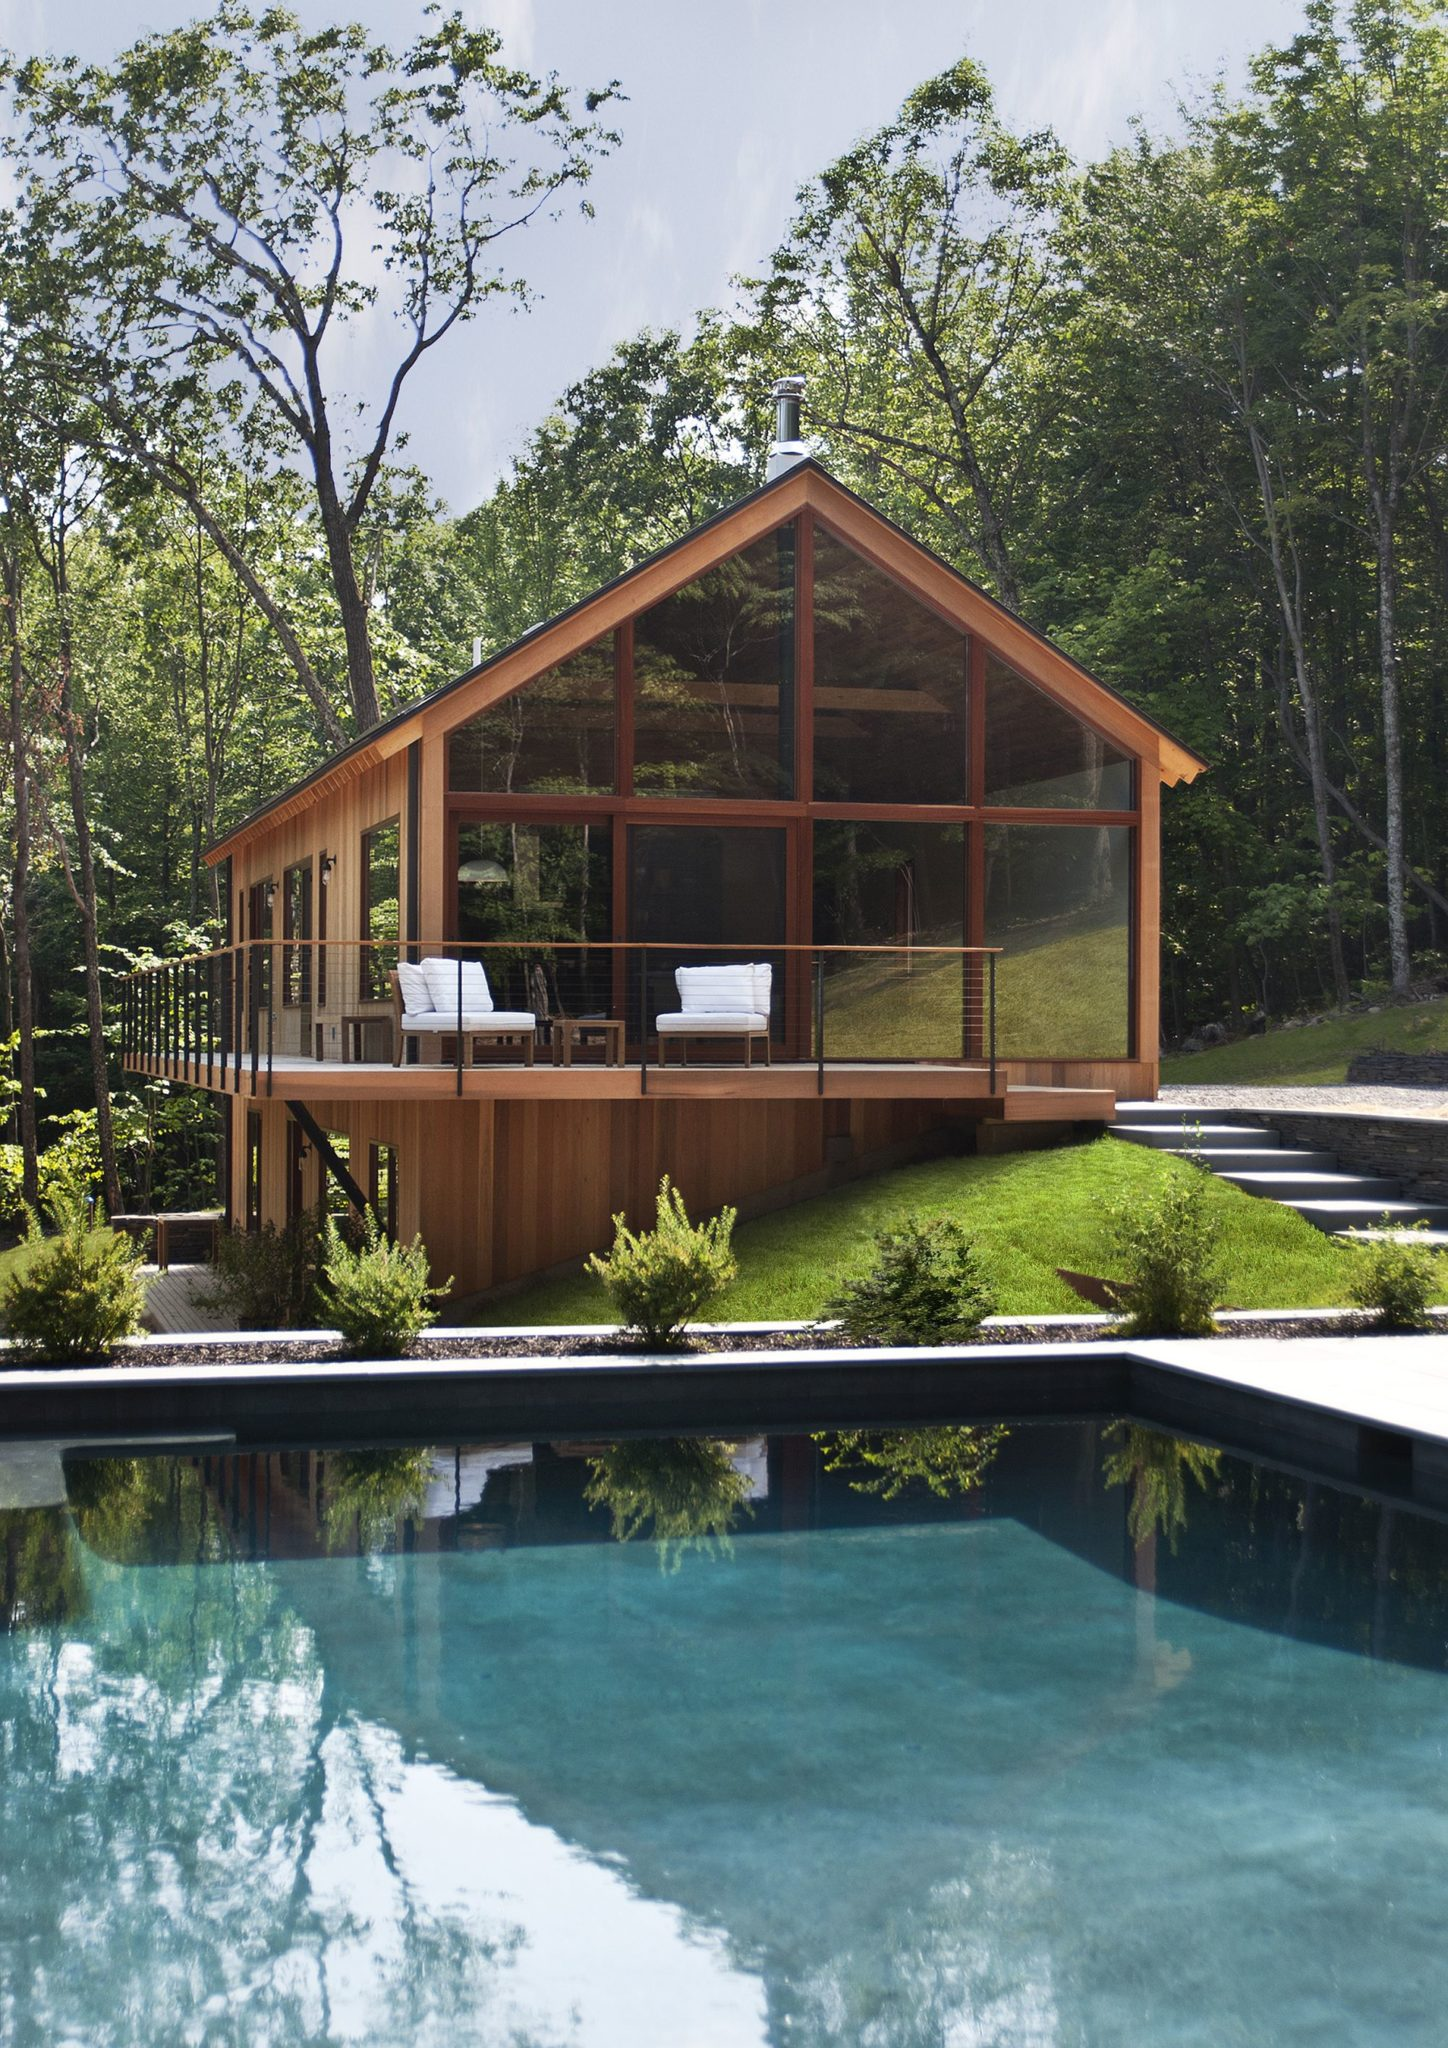 View In Gallery Dashing Modern Cabin Design At Hudson Woods